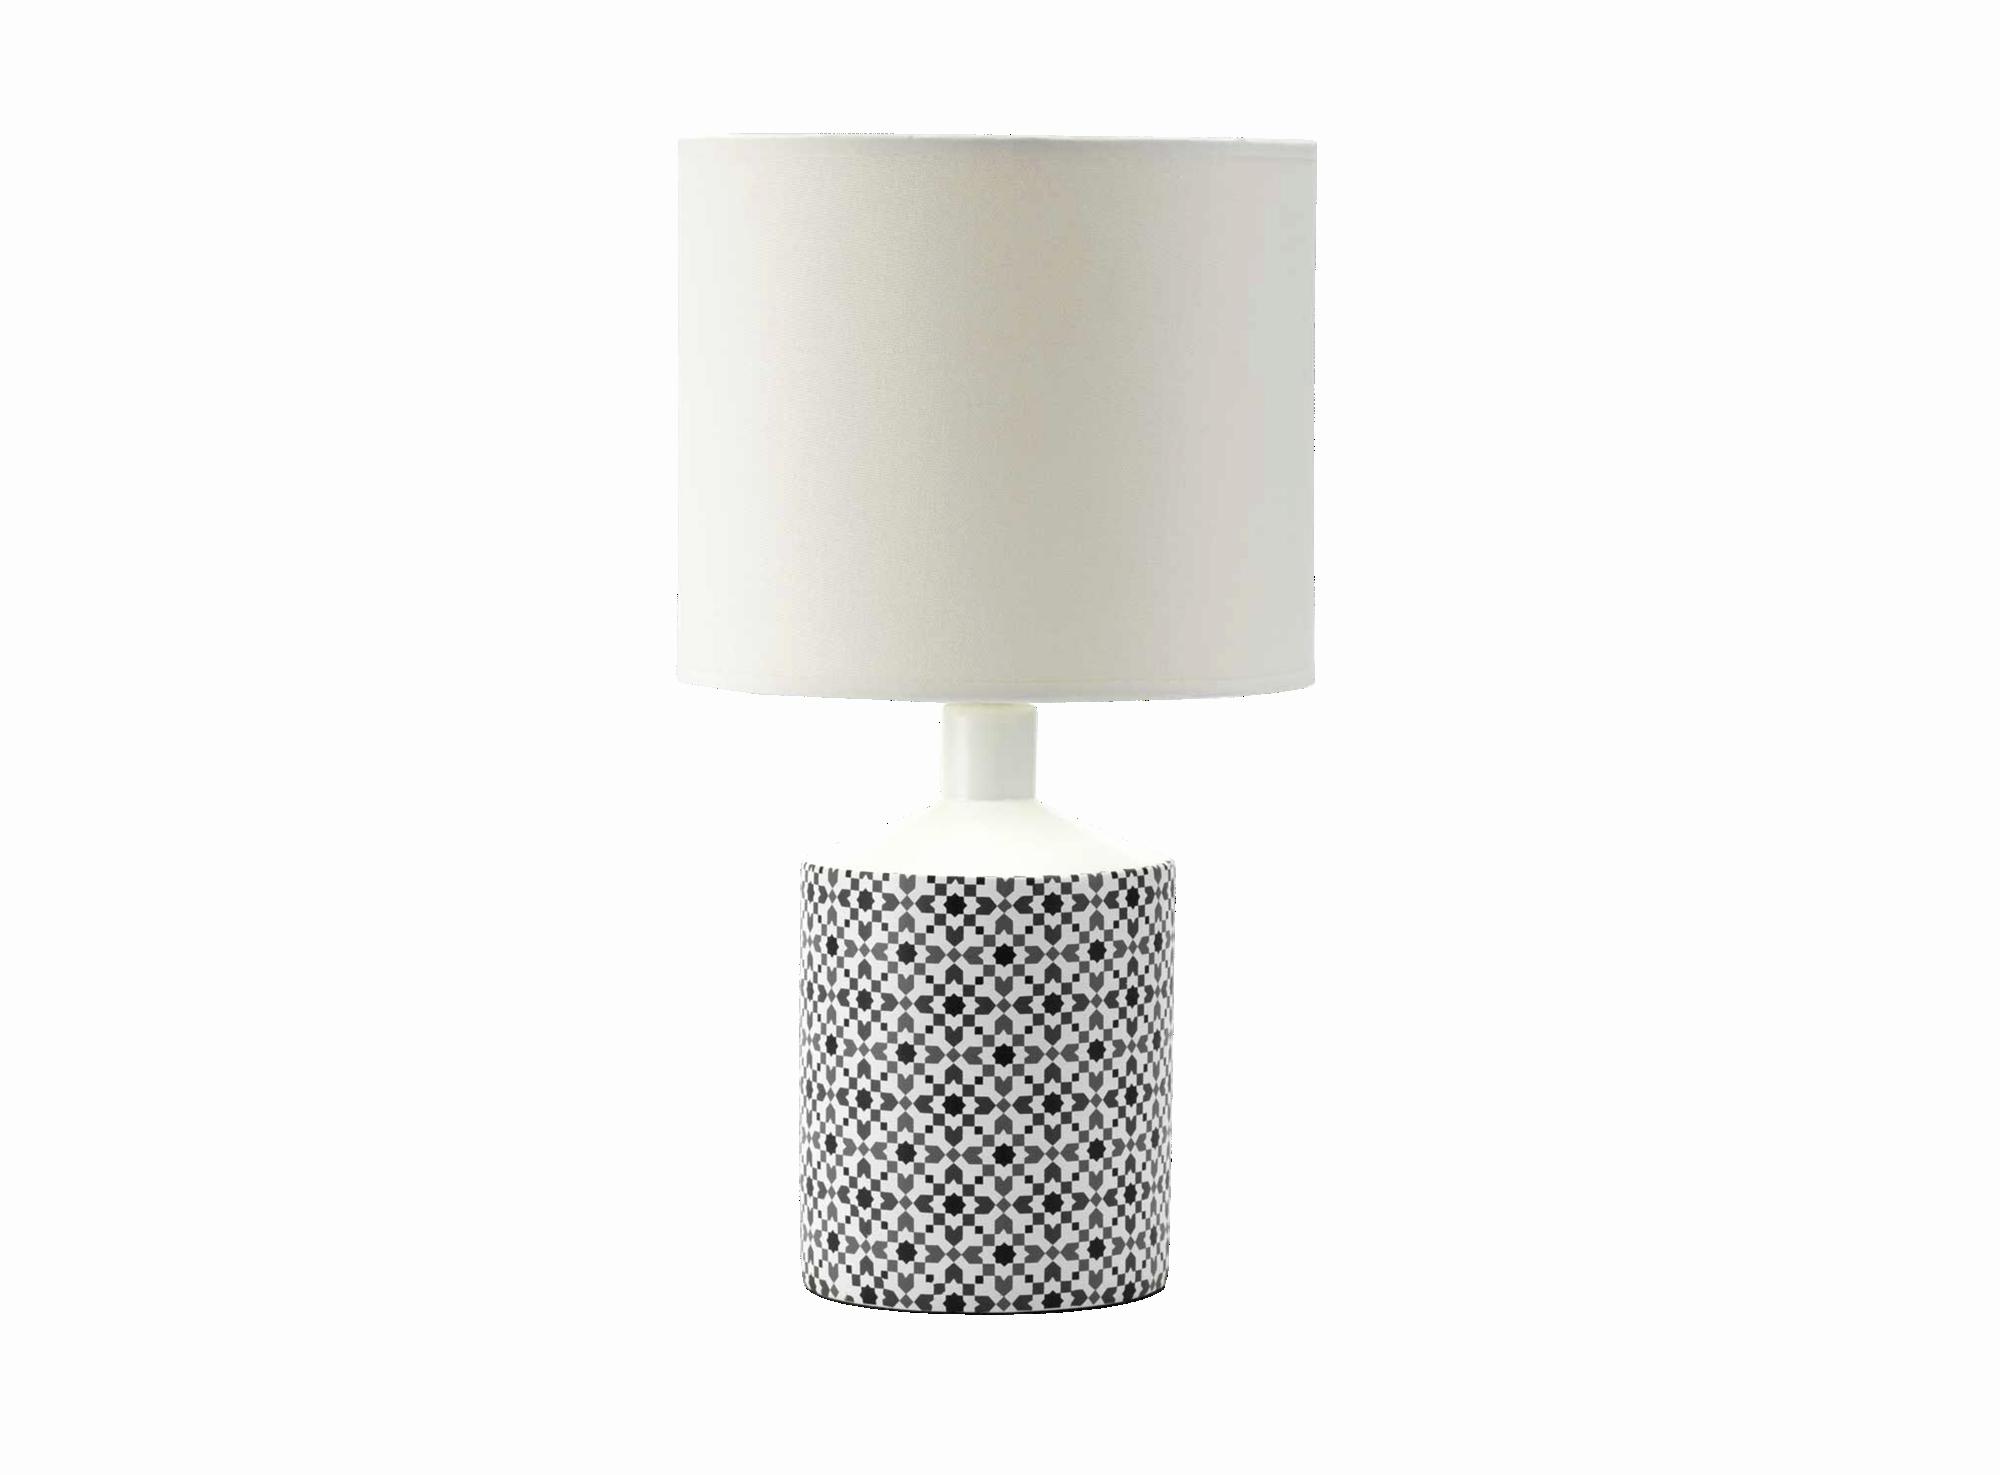 Lampe design wikipedia